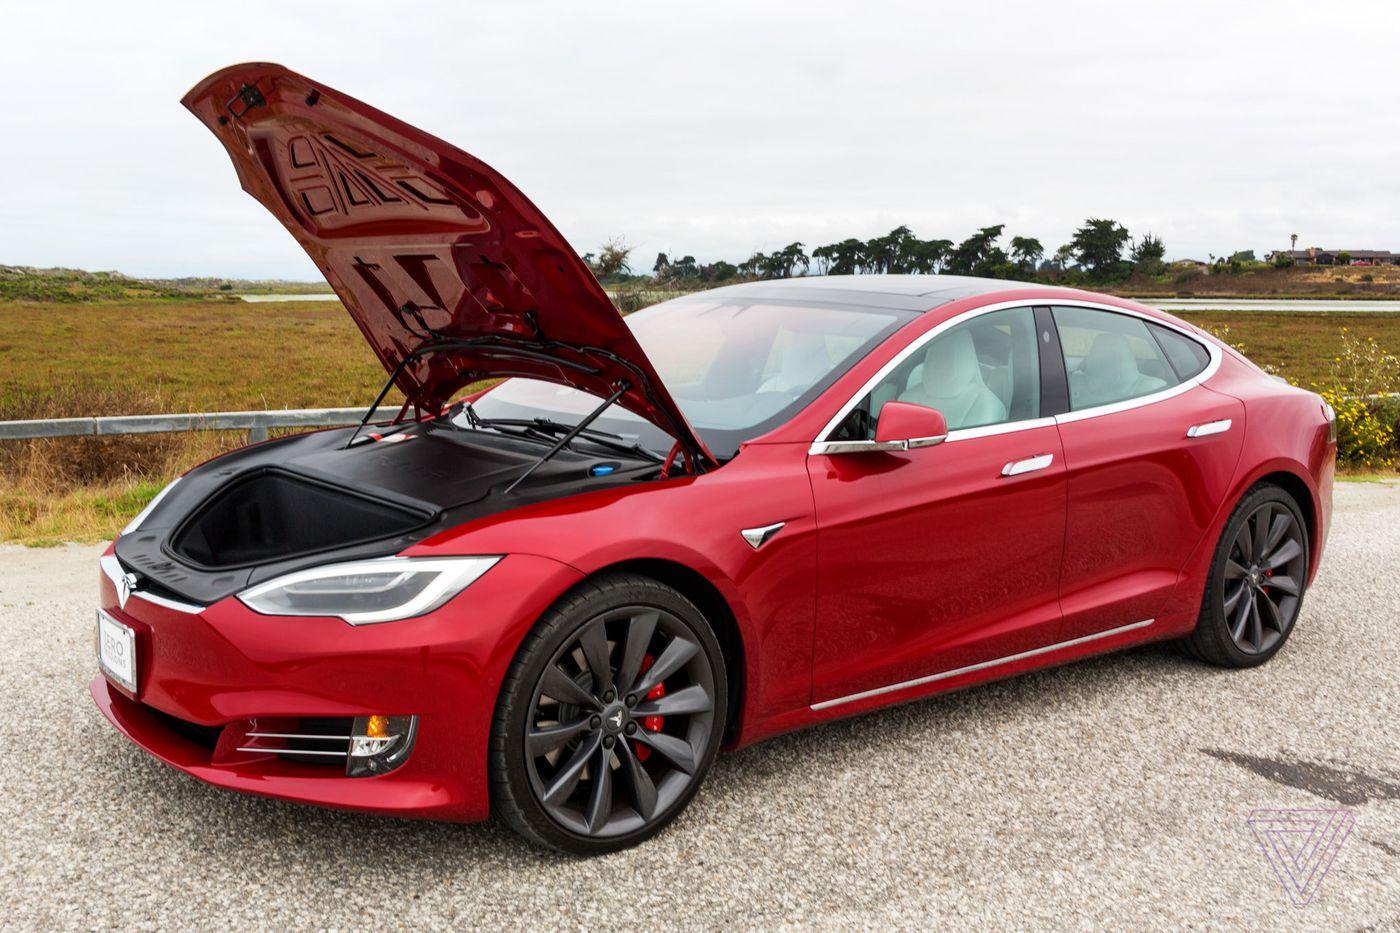 Tesla Model S P100D review: the ultimate status symbol of